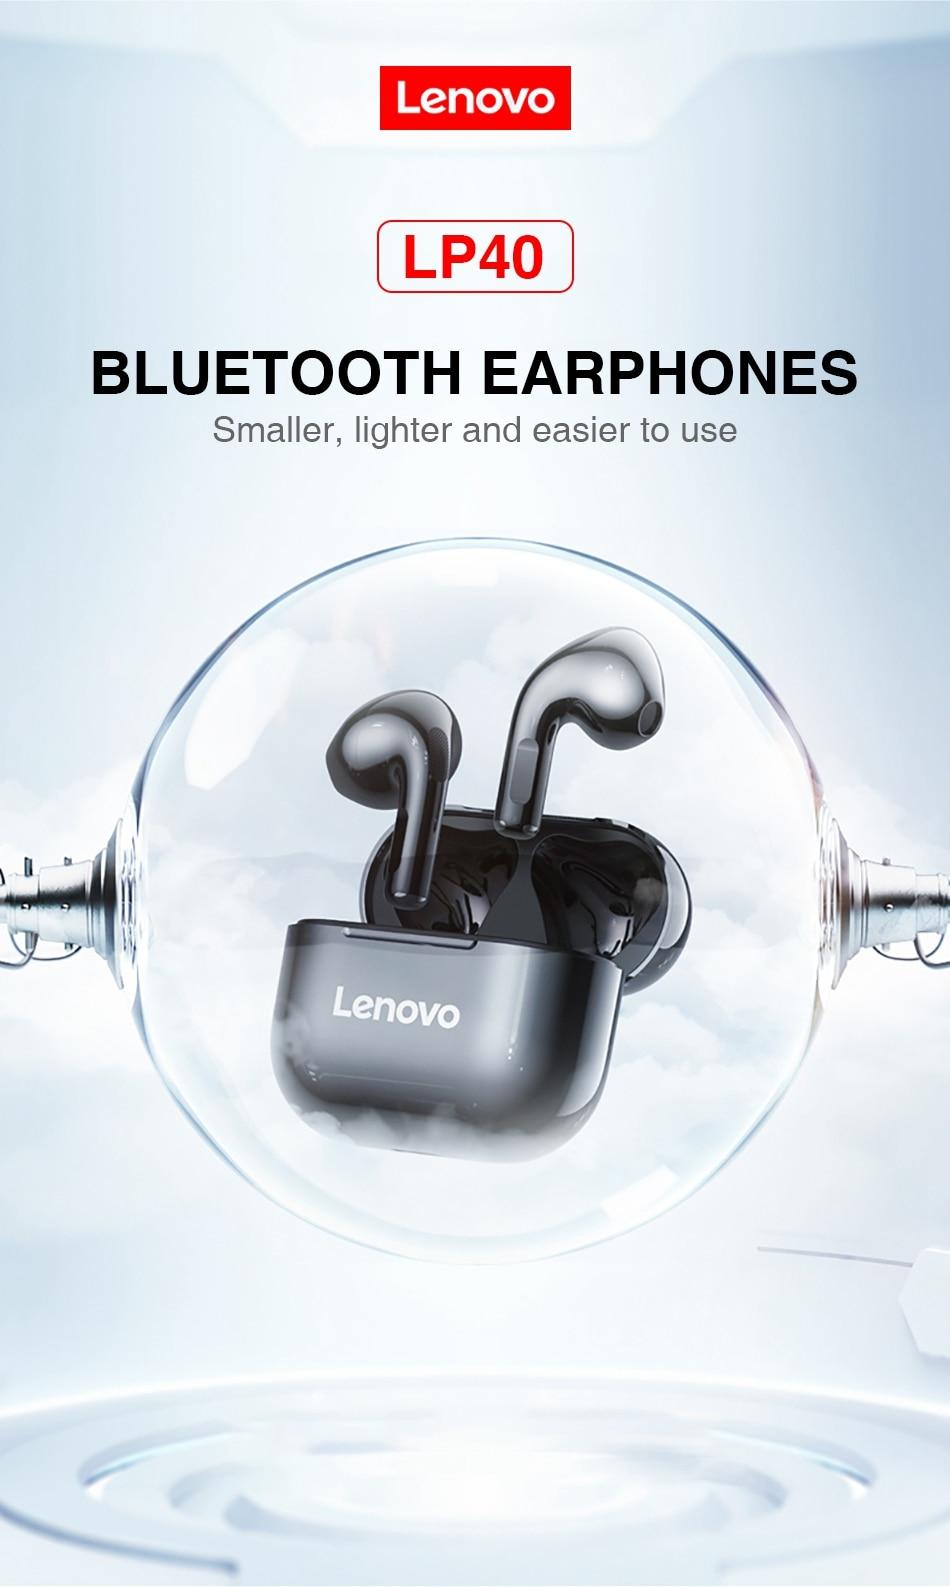 Lenovo LP40 TWS Wireless Bluetooth Earbuds 4